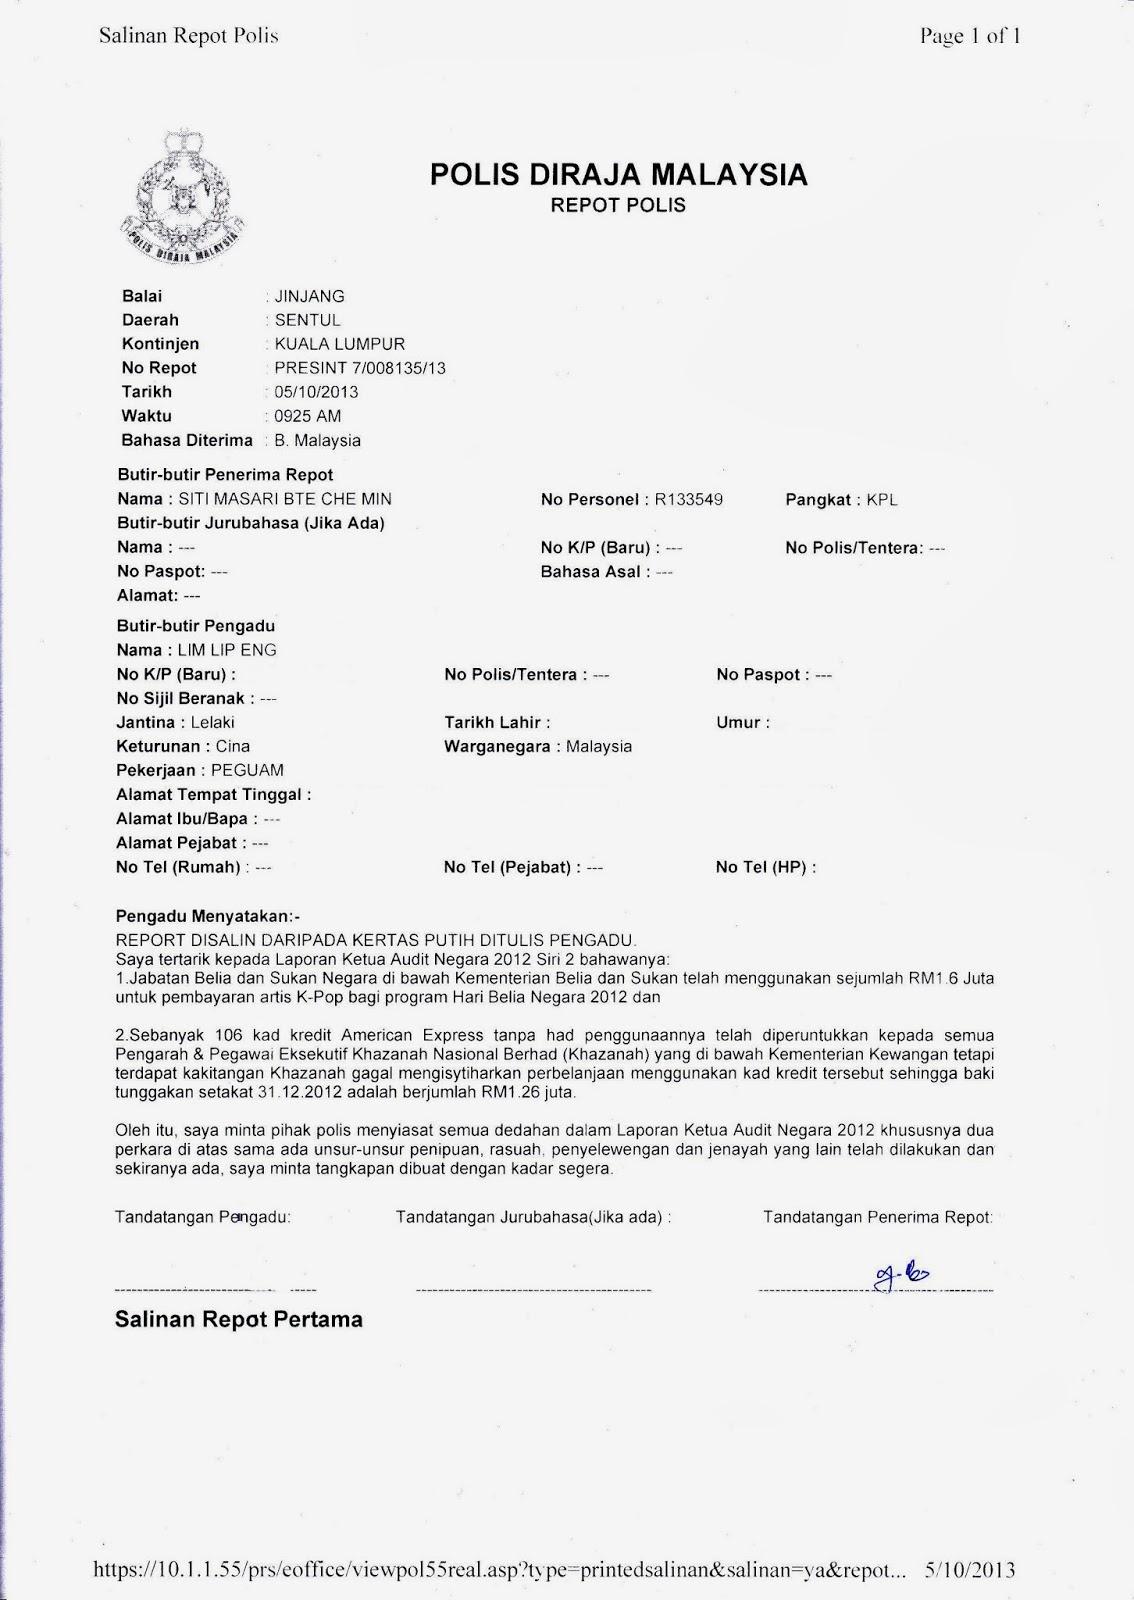 9 46 auditing Circular 2013/3 auditing  segregation of audit and financial audit margin nos 45-46 ix  circular 2013/3 auditing   9 financial services.